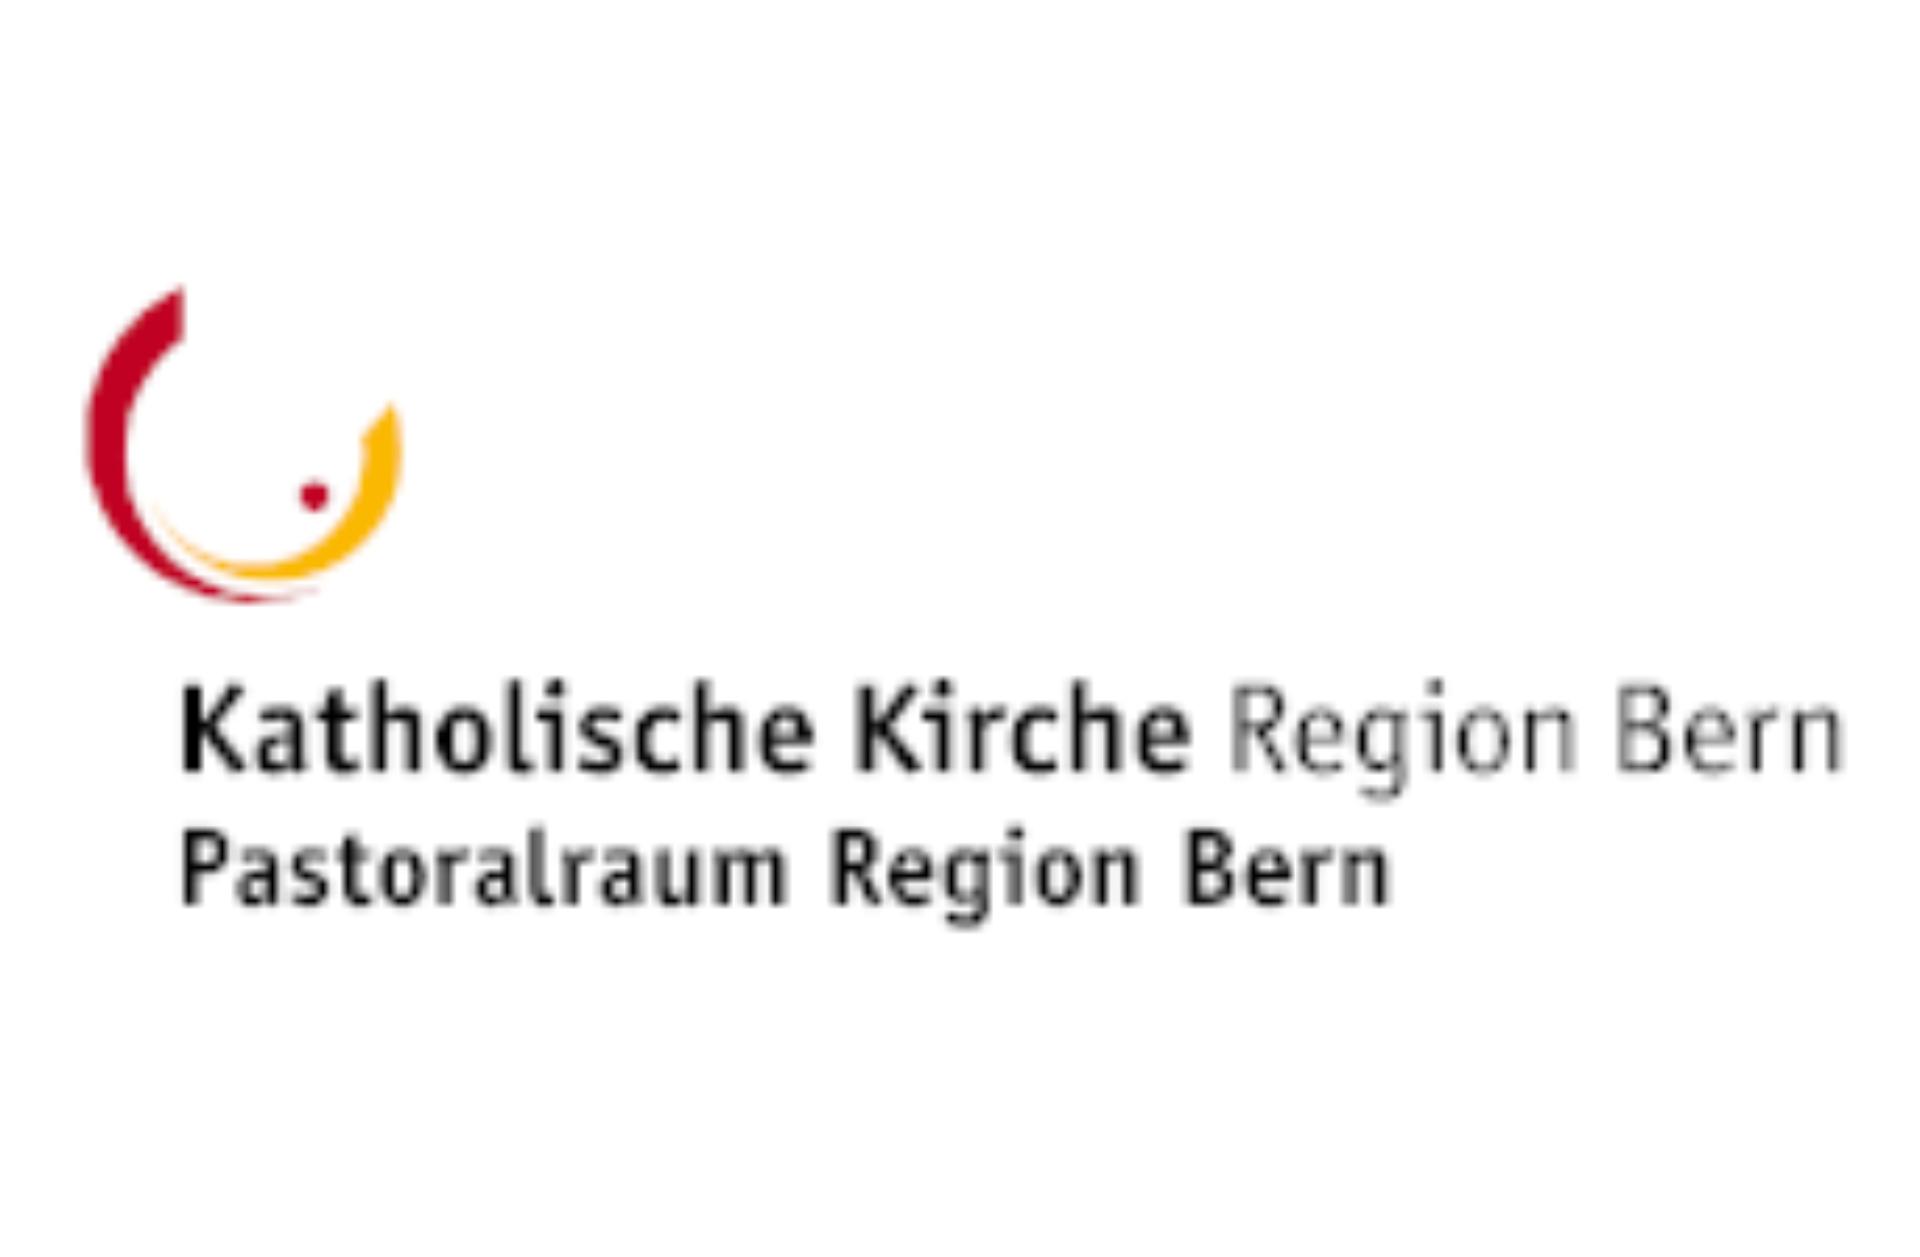 Pastoralraum Kath. Bern